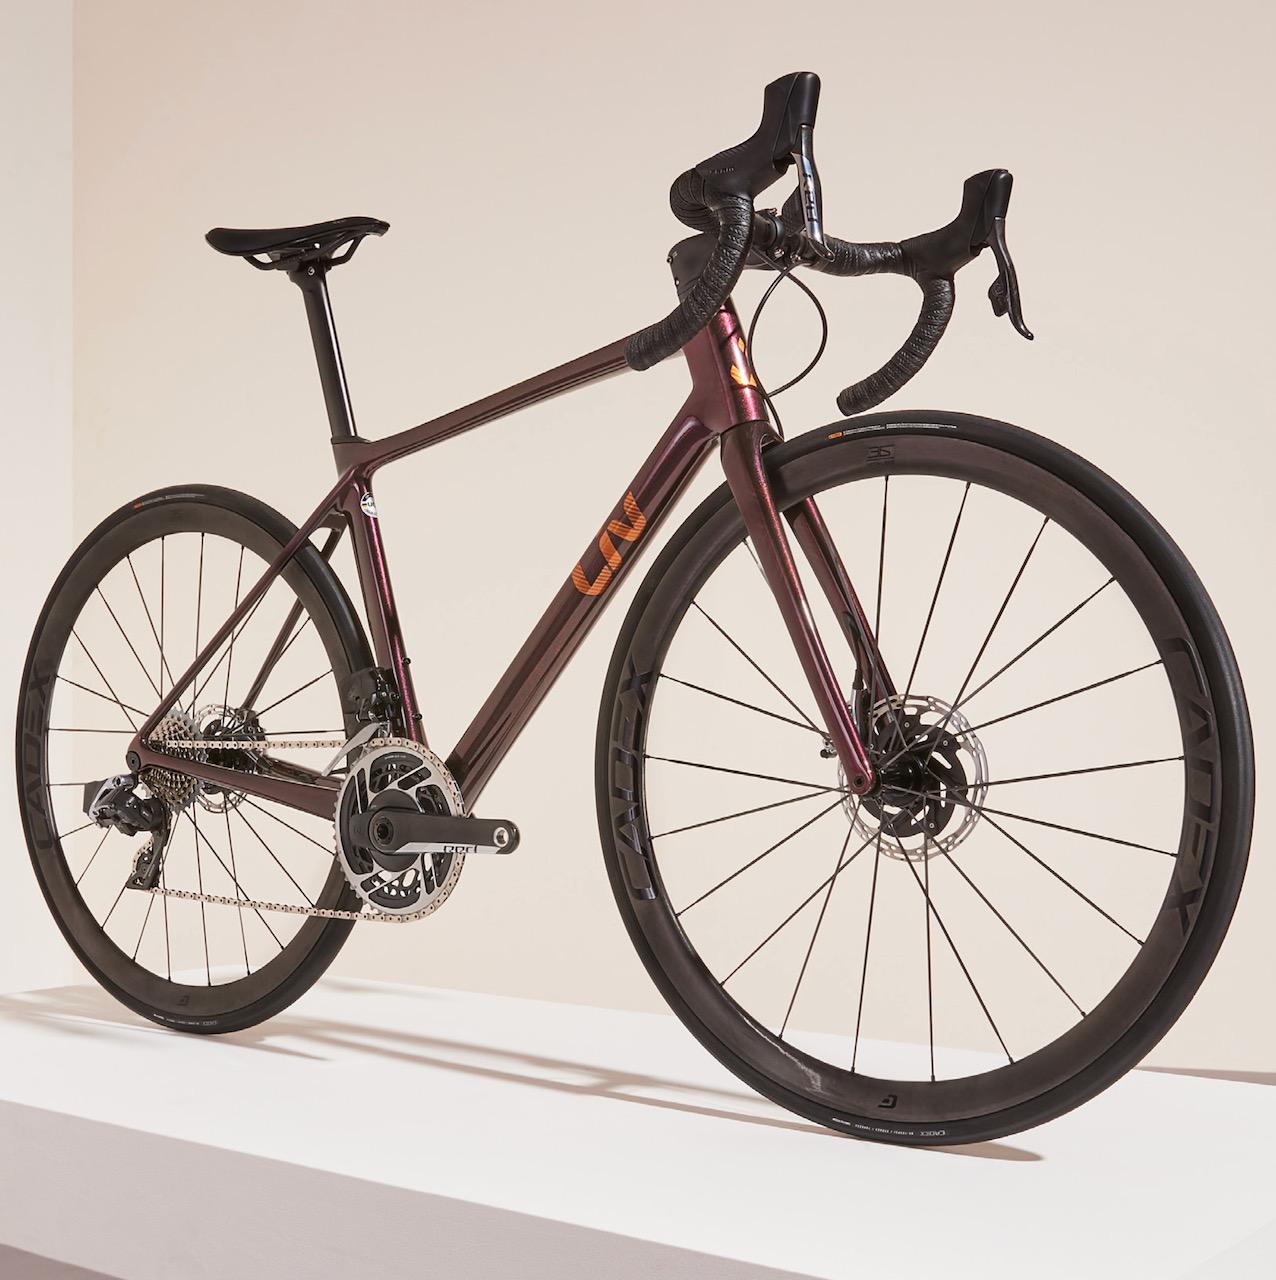 2022 Liv Langma disc full bike